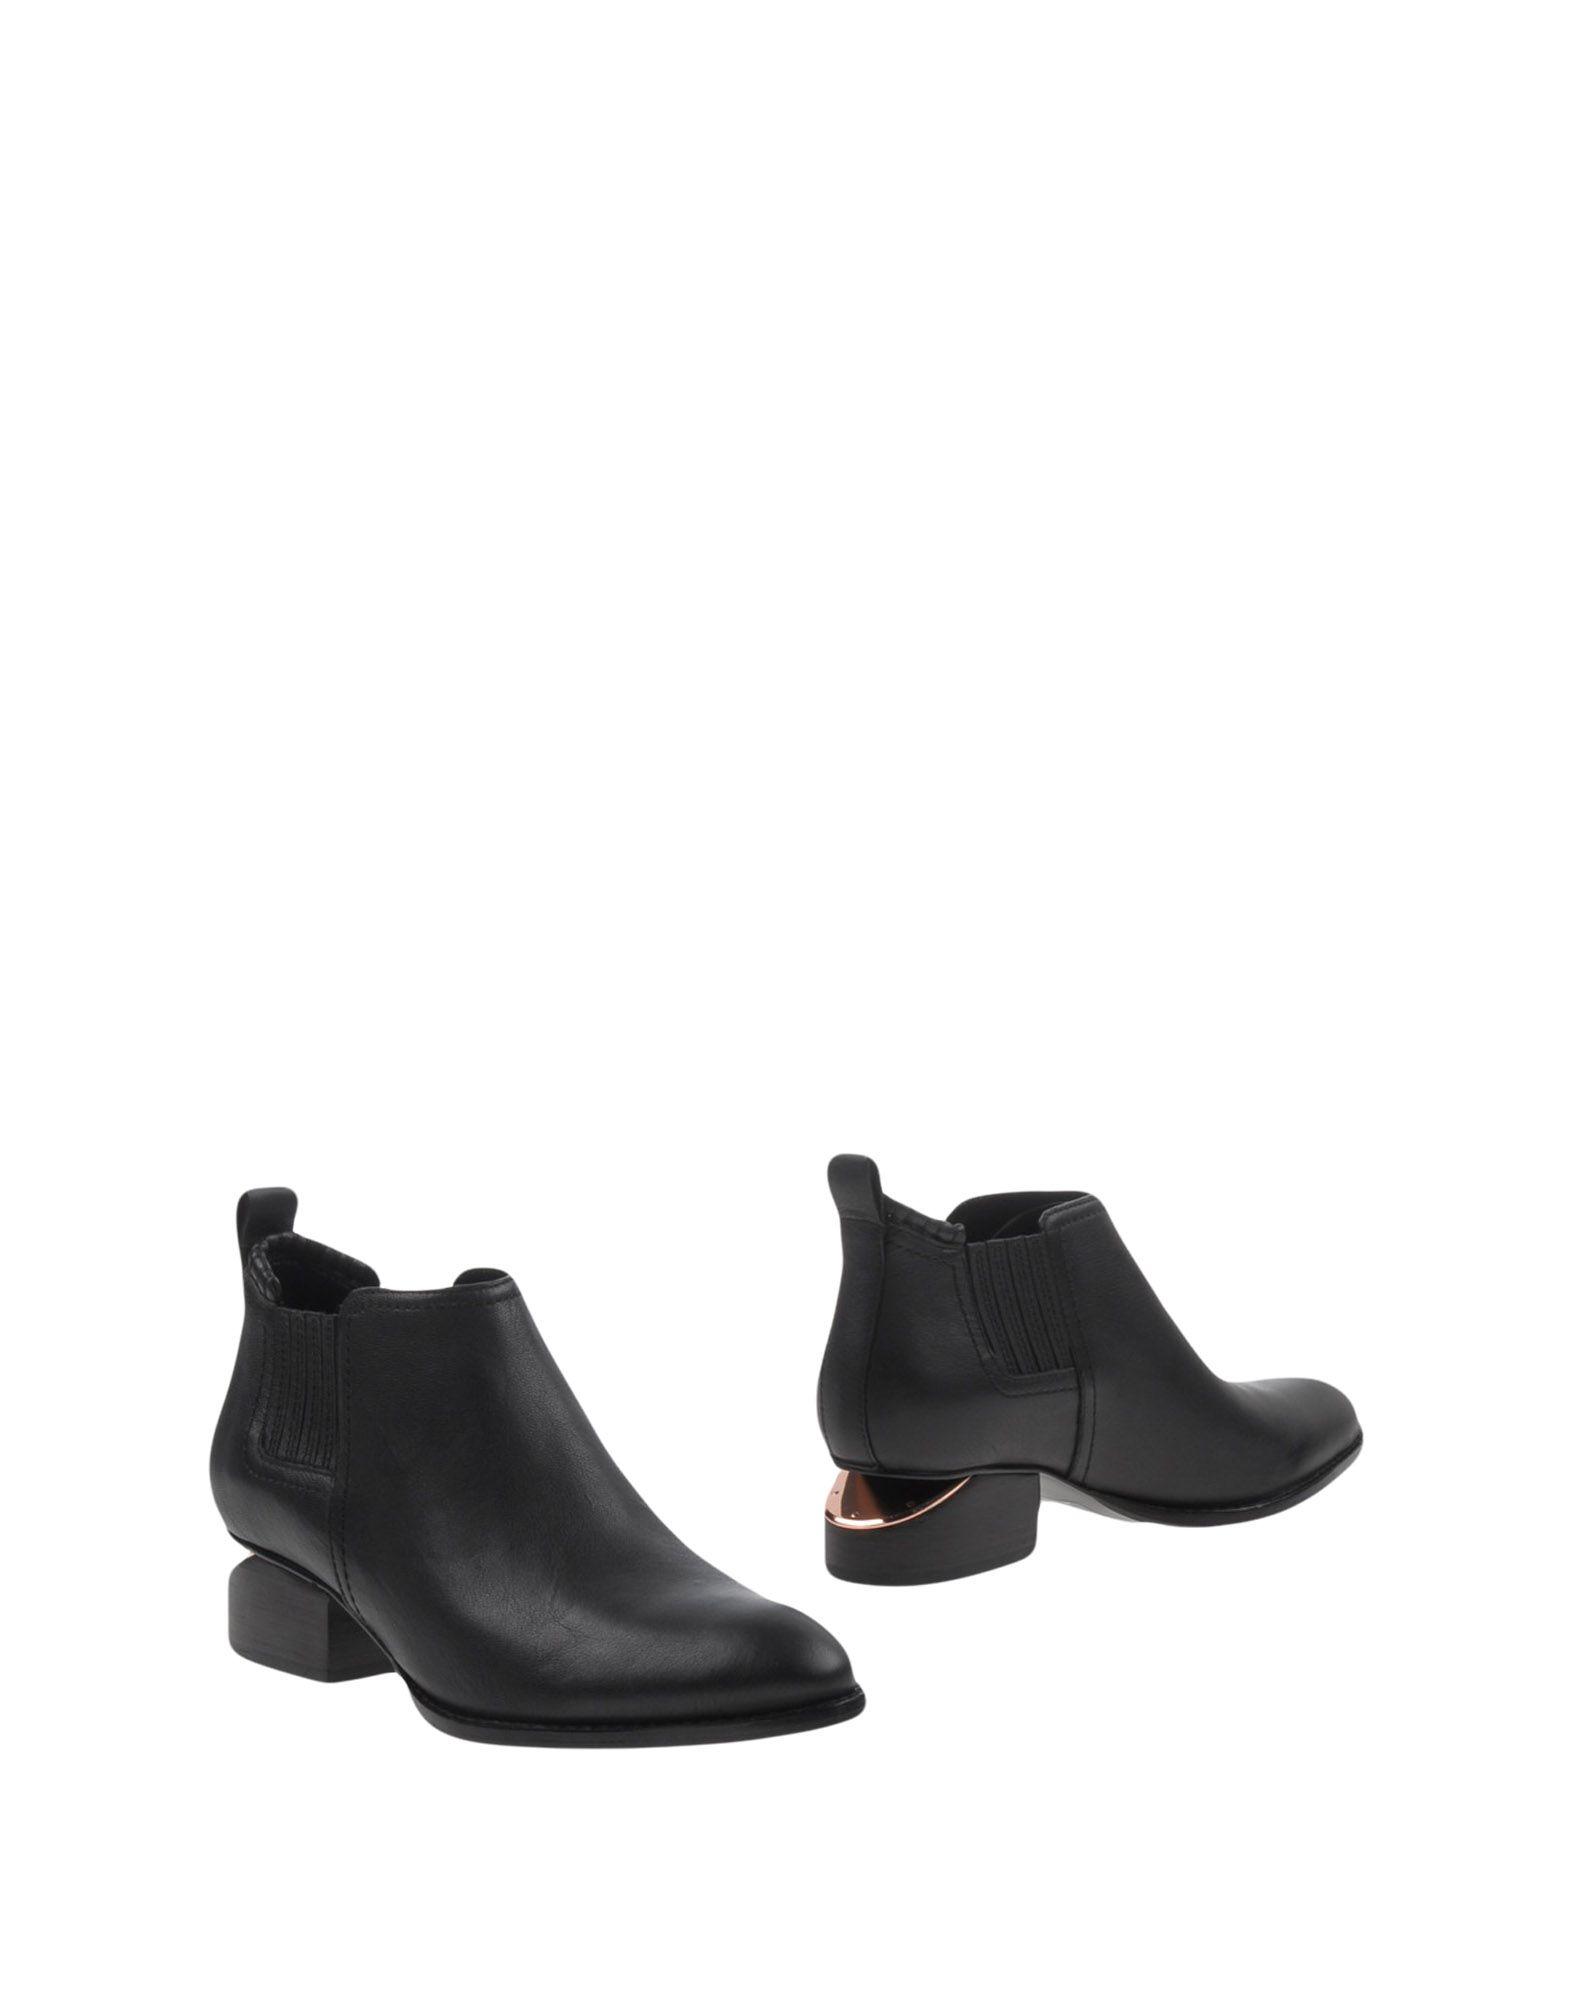 Alexander Wang Stiefelette Damen  11357925DXGünstige gut aussehende Schuhe